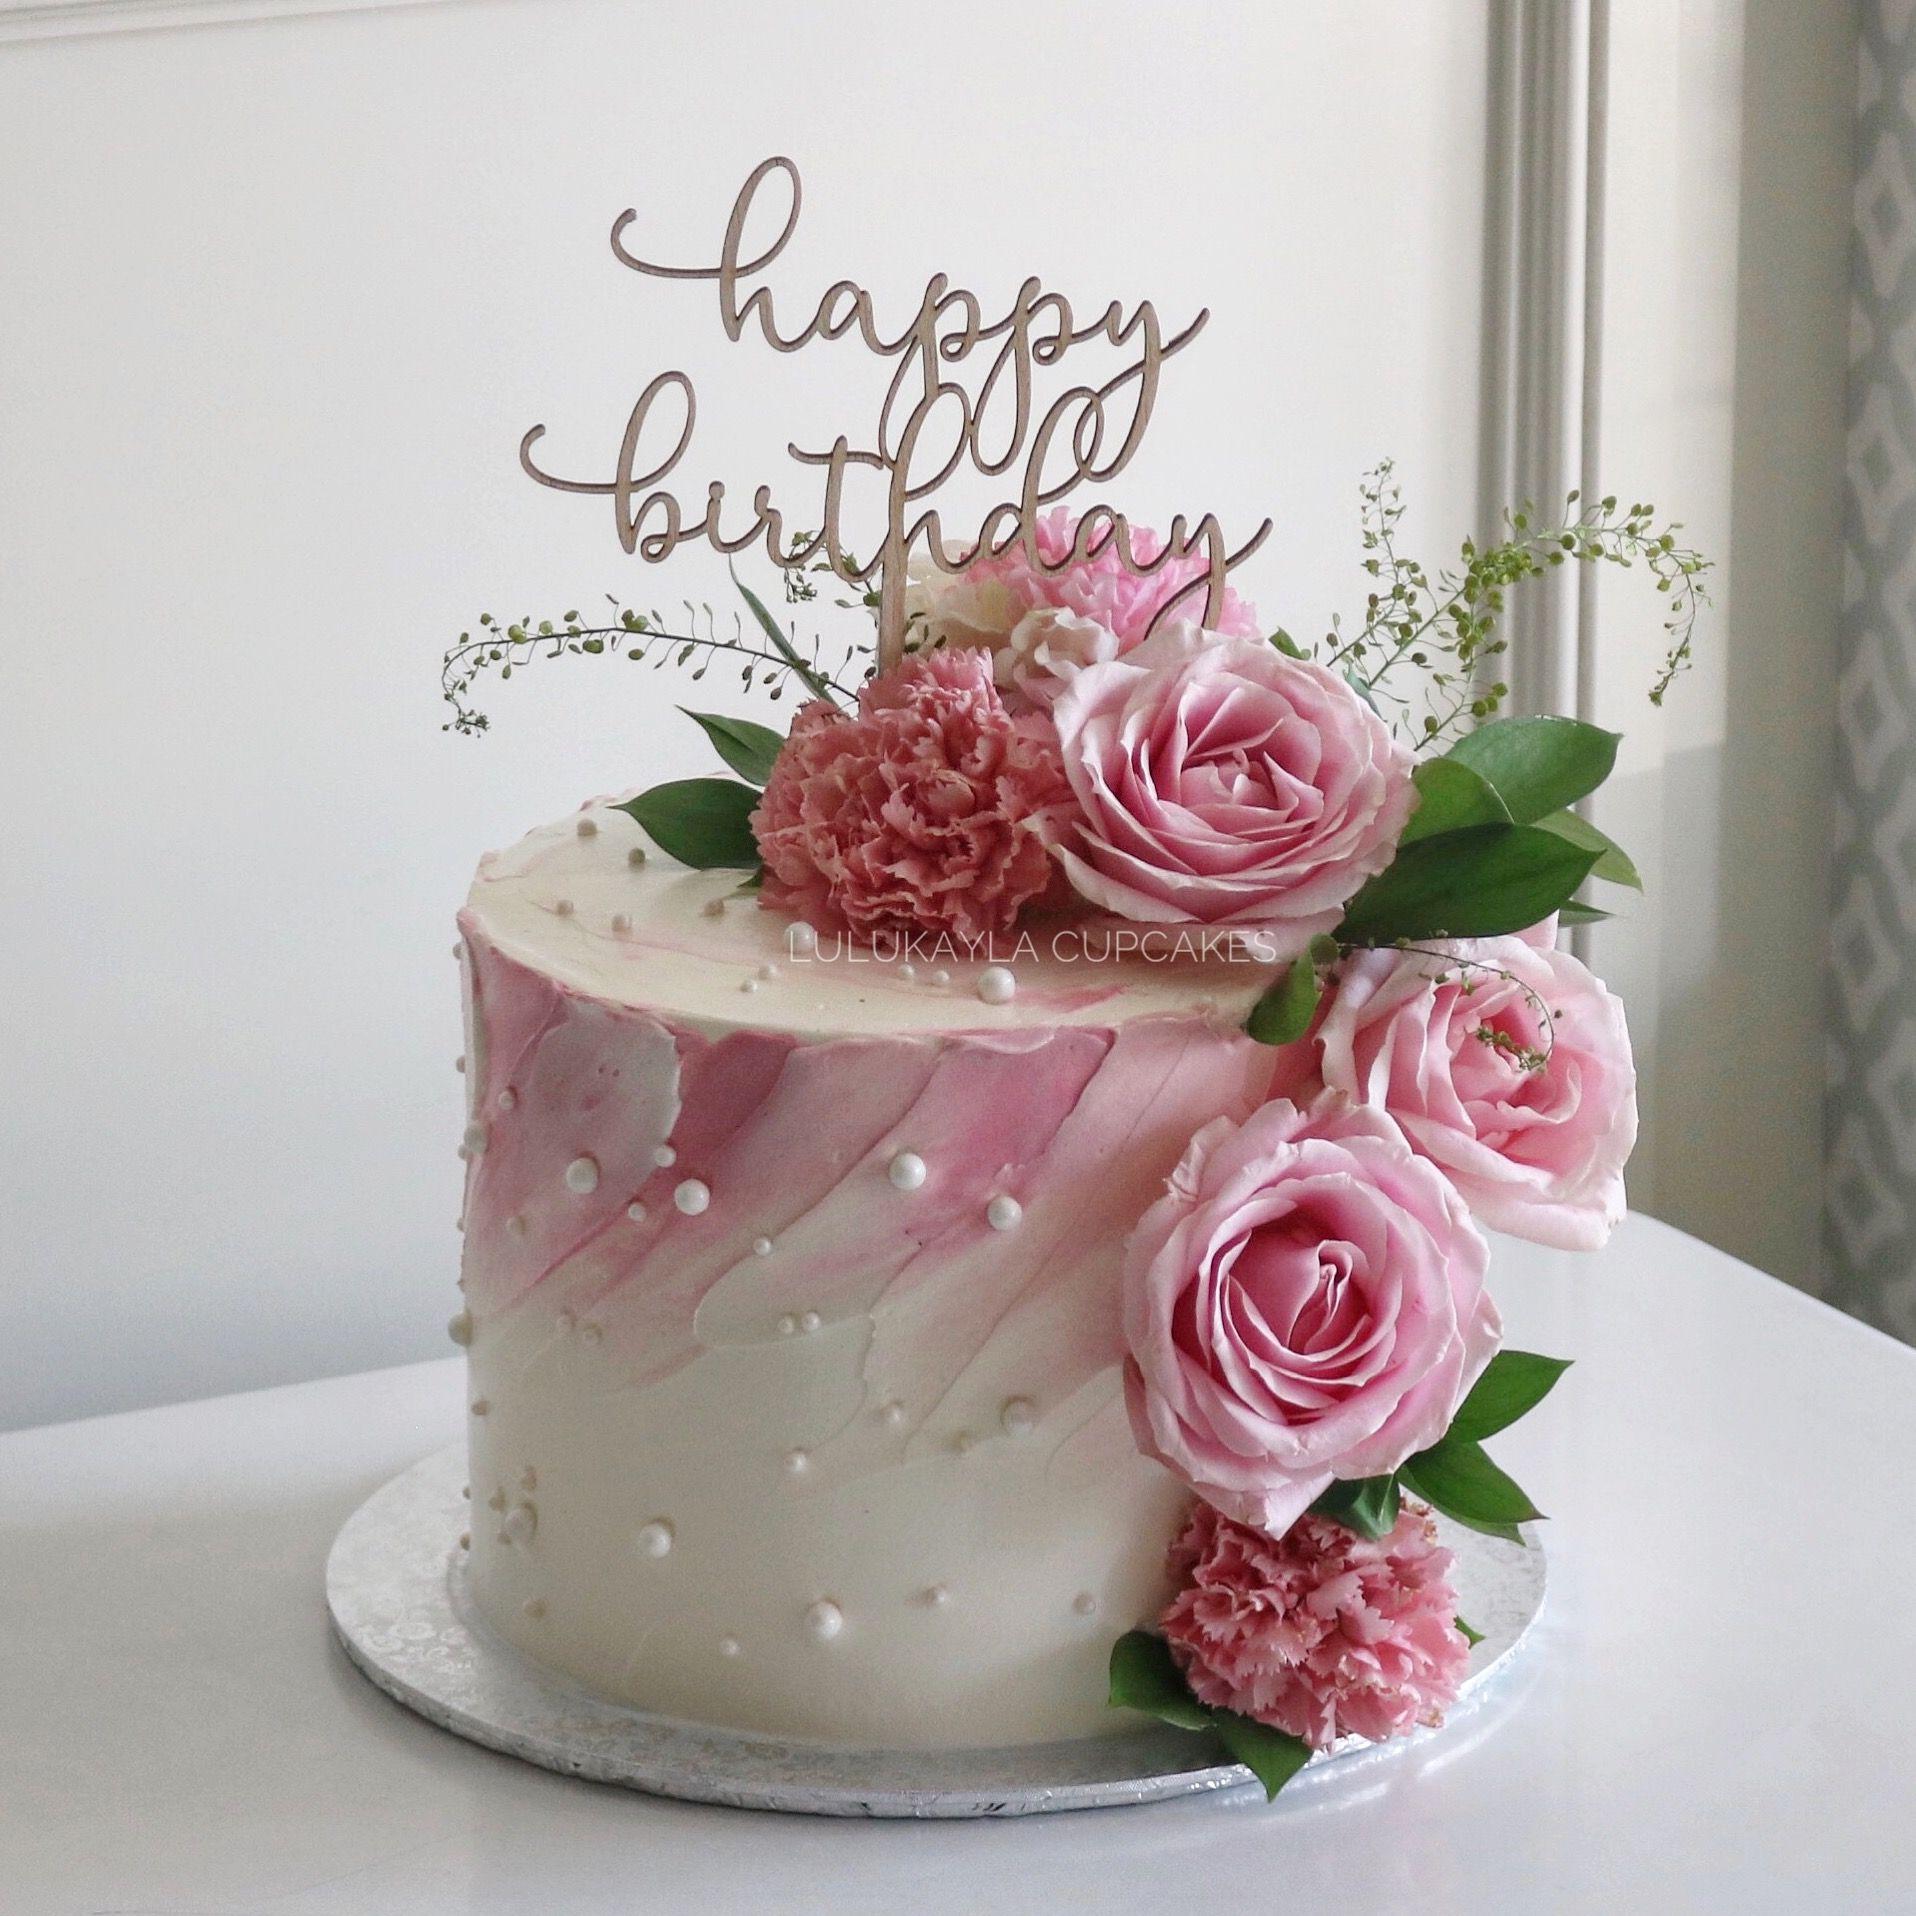 Flower cake 80 birthday cake, Birthday cake with flowers